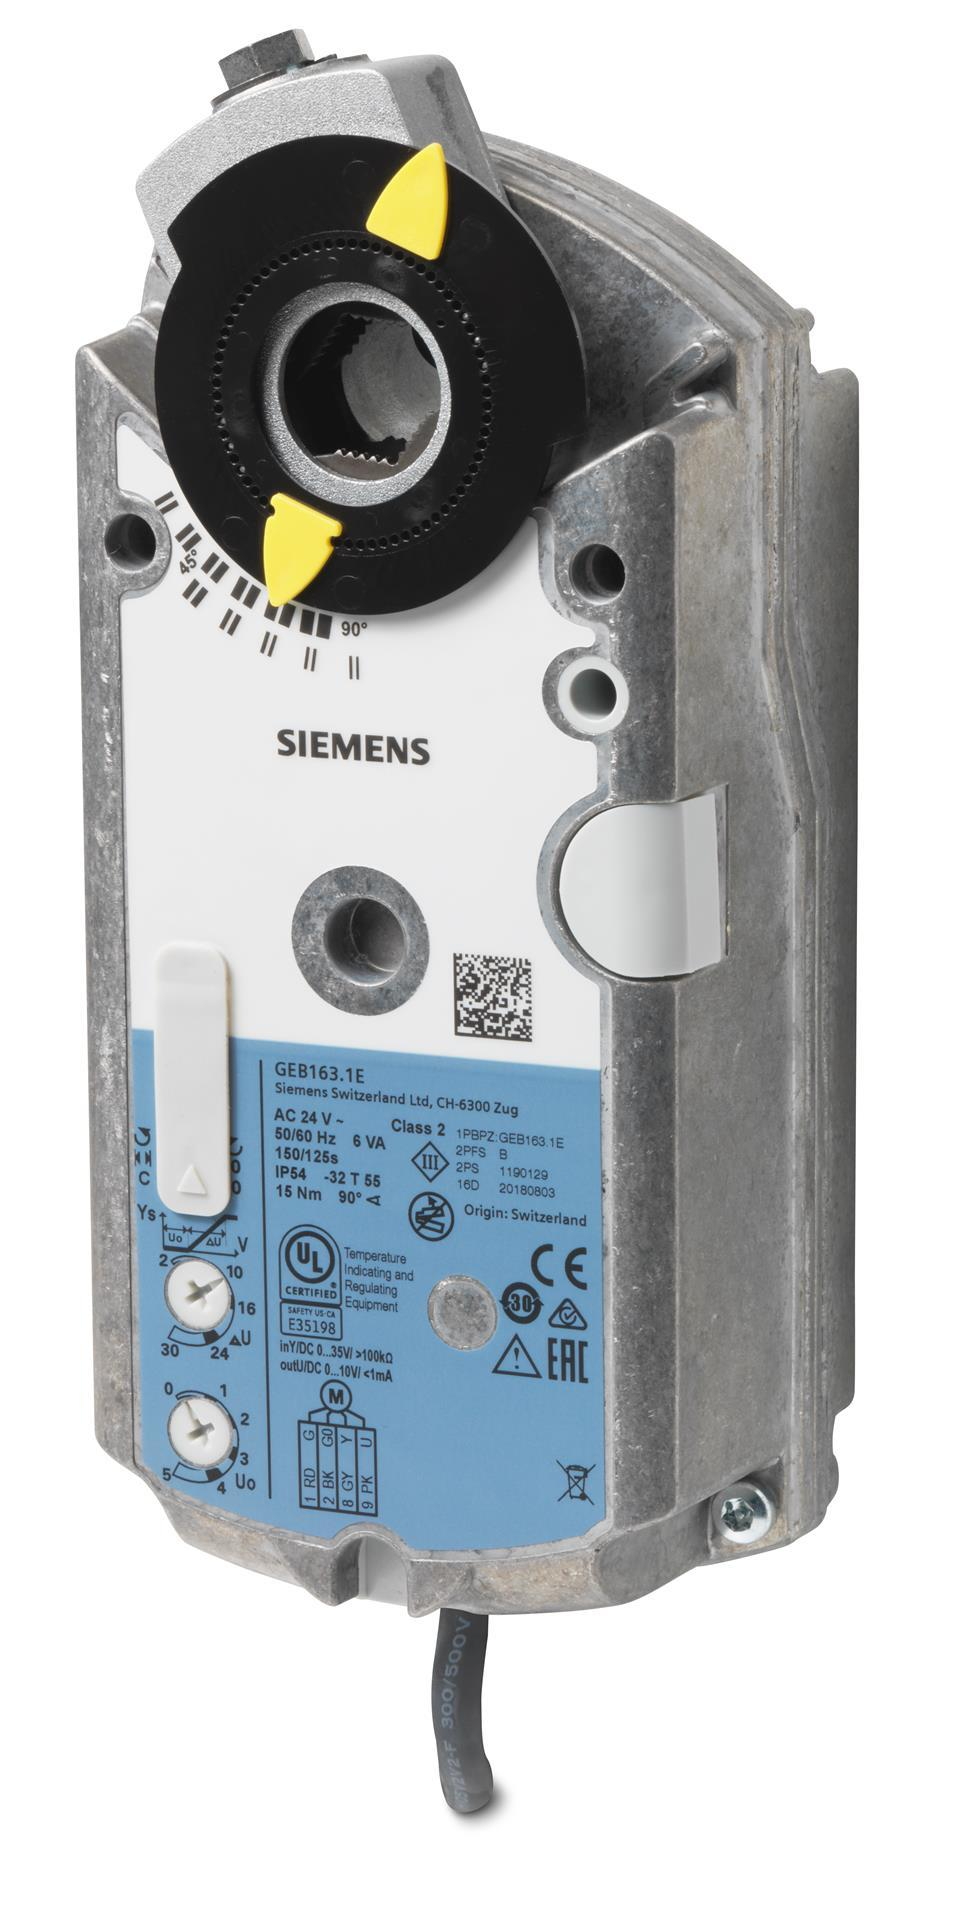 Siemens GEB163.1E